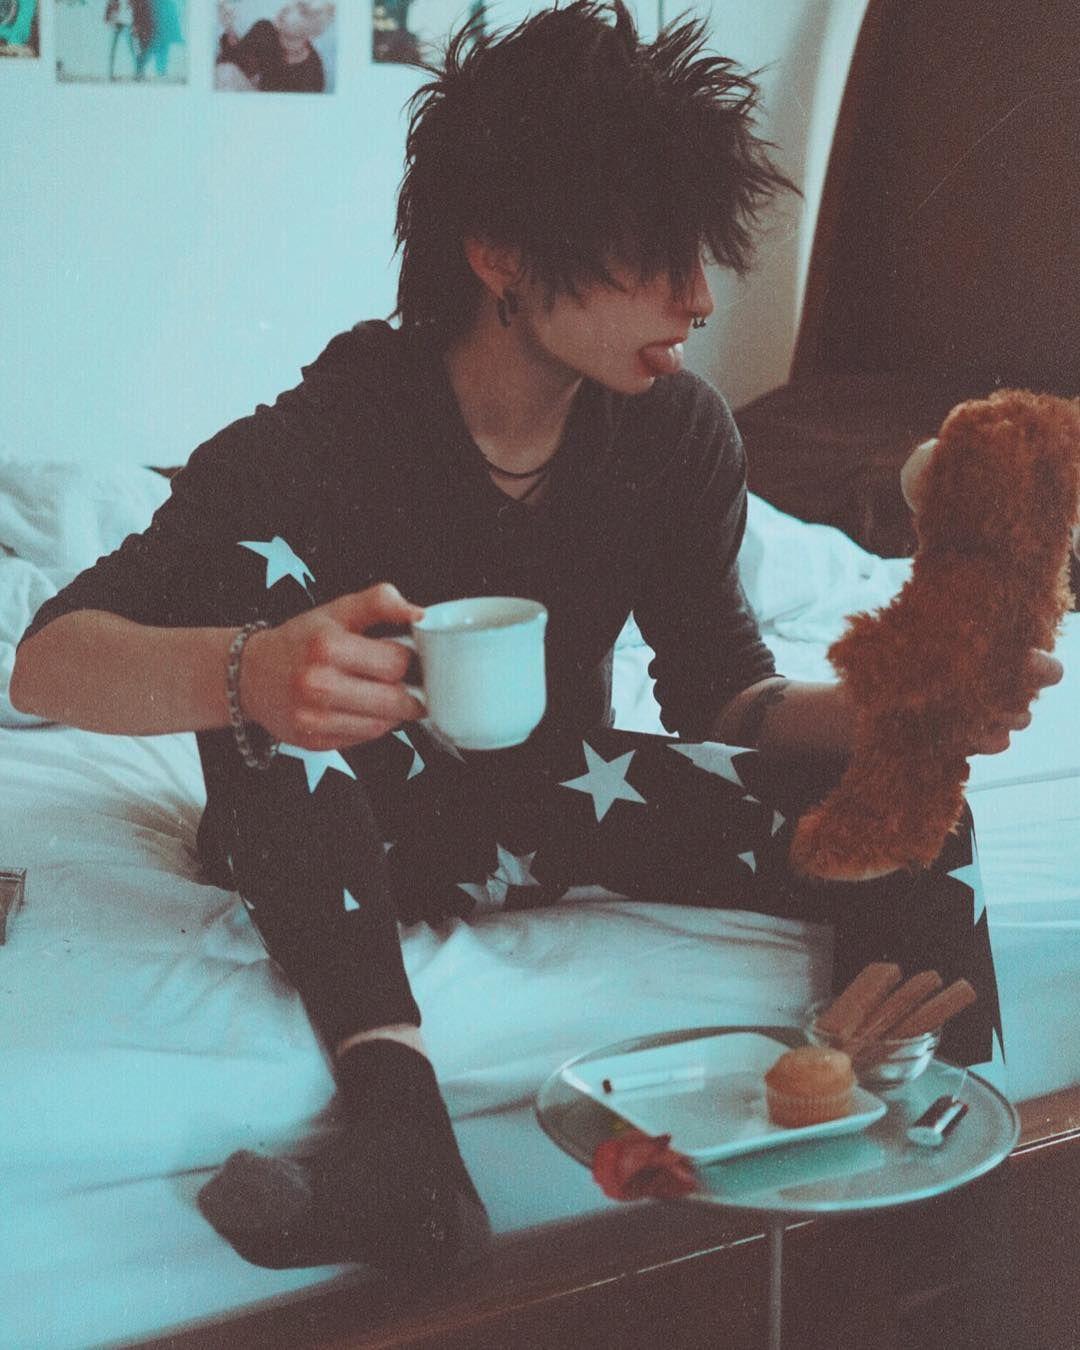 Breakfast With Winnie The Pooh Grunge Softgrunge Aesthetic Tumblrboy Emo Animeboy Emoboy Alternative Cosplay Cute Emo Emo Grunge Boy ✰ soft boy aesthetic  finding your aesthetic  nuel obodokwe. cute emo